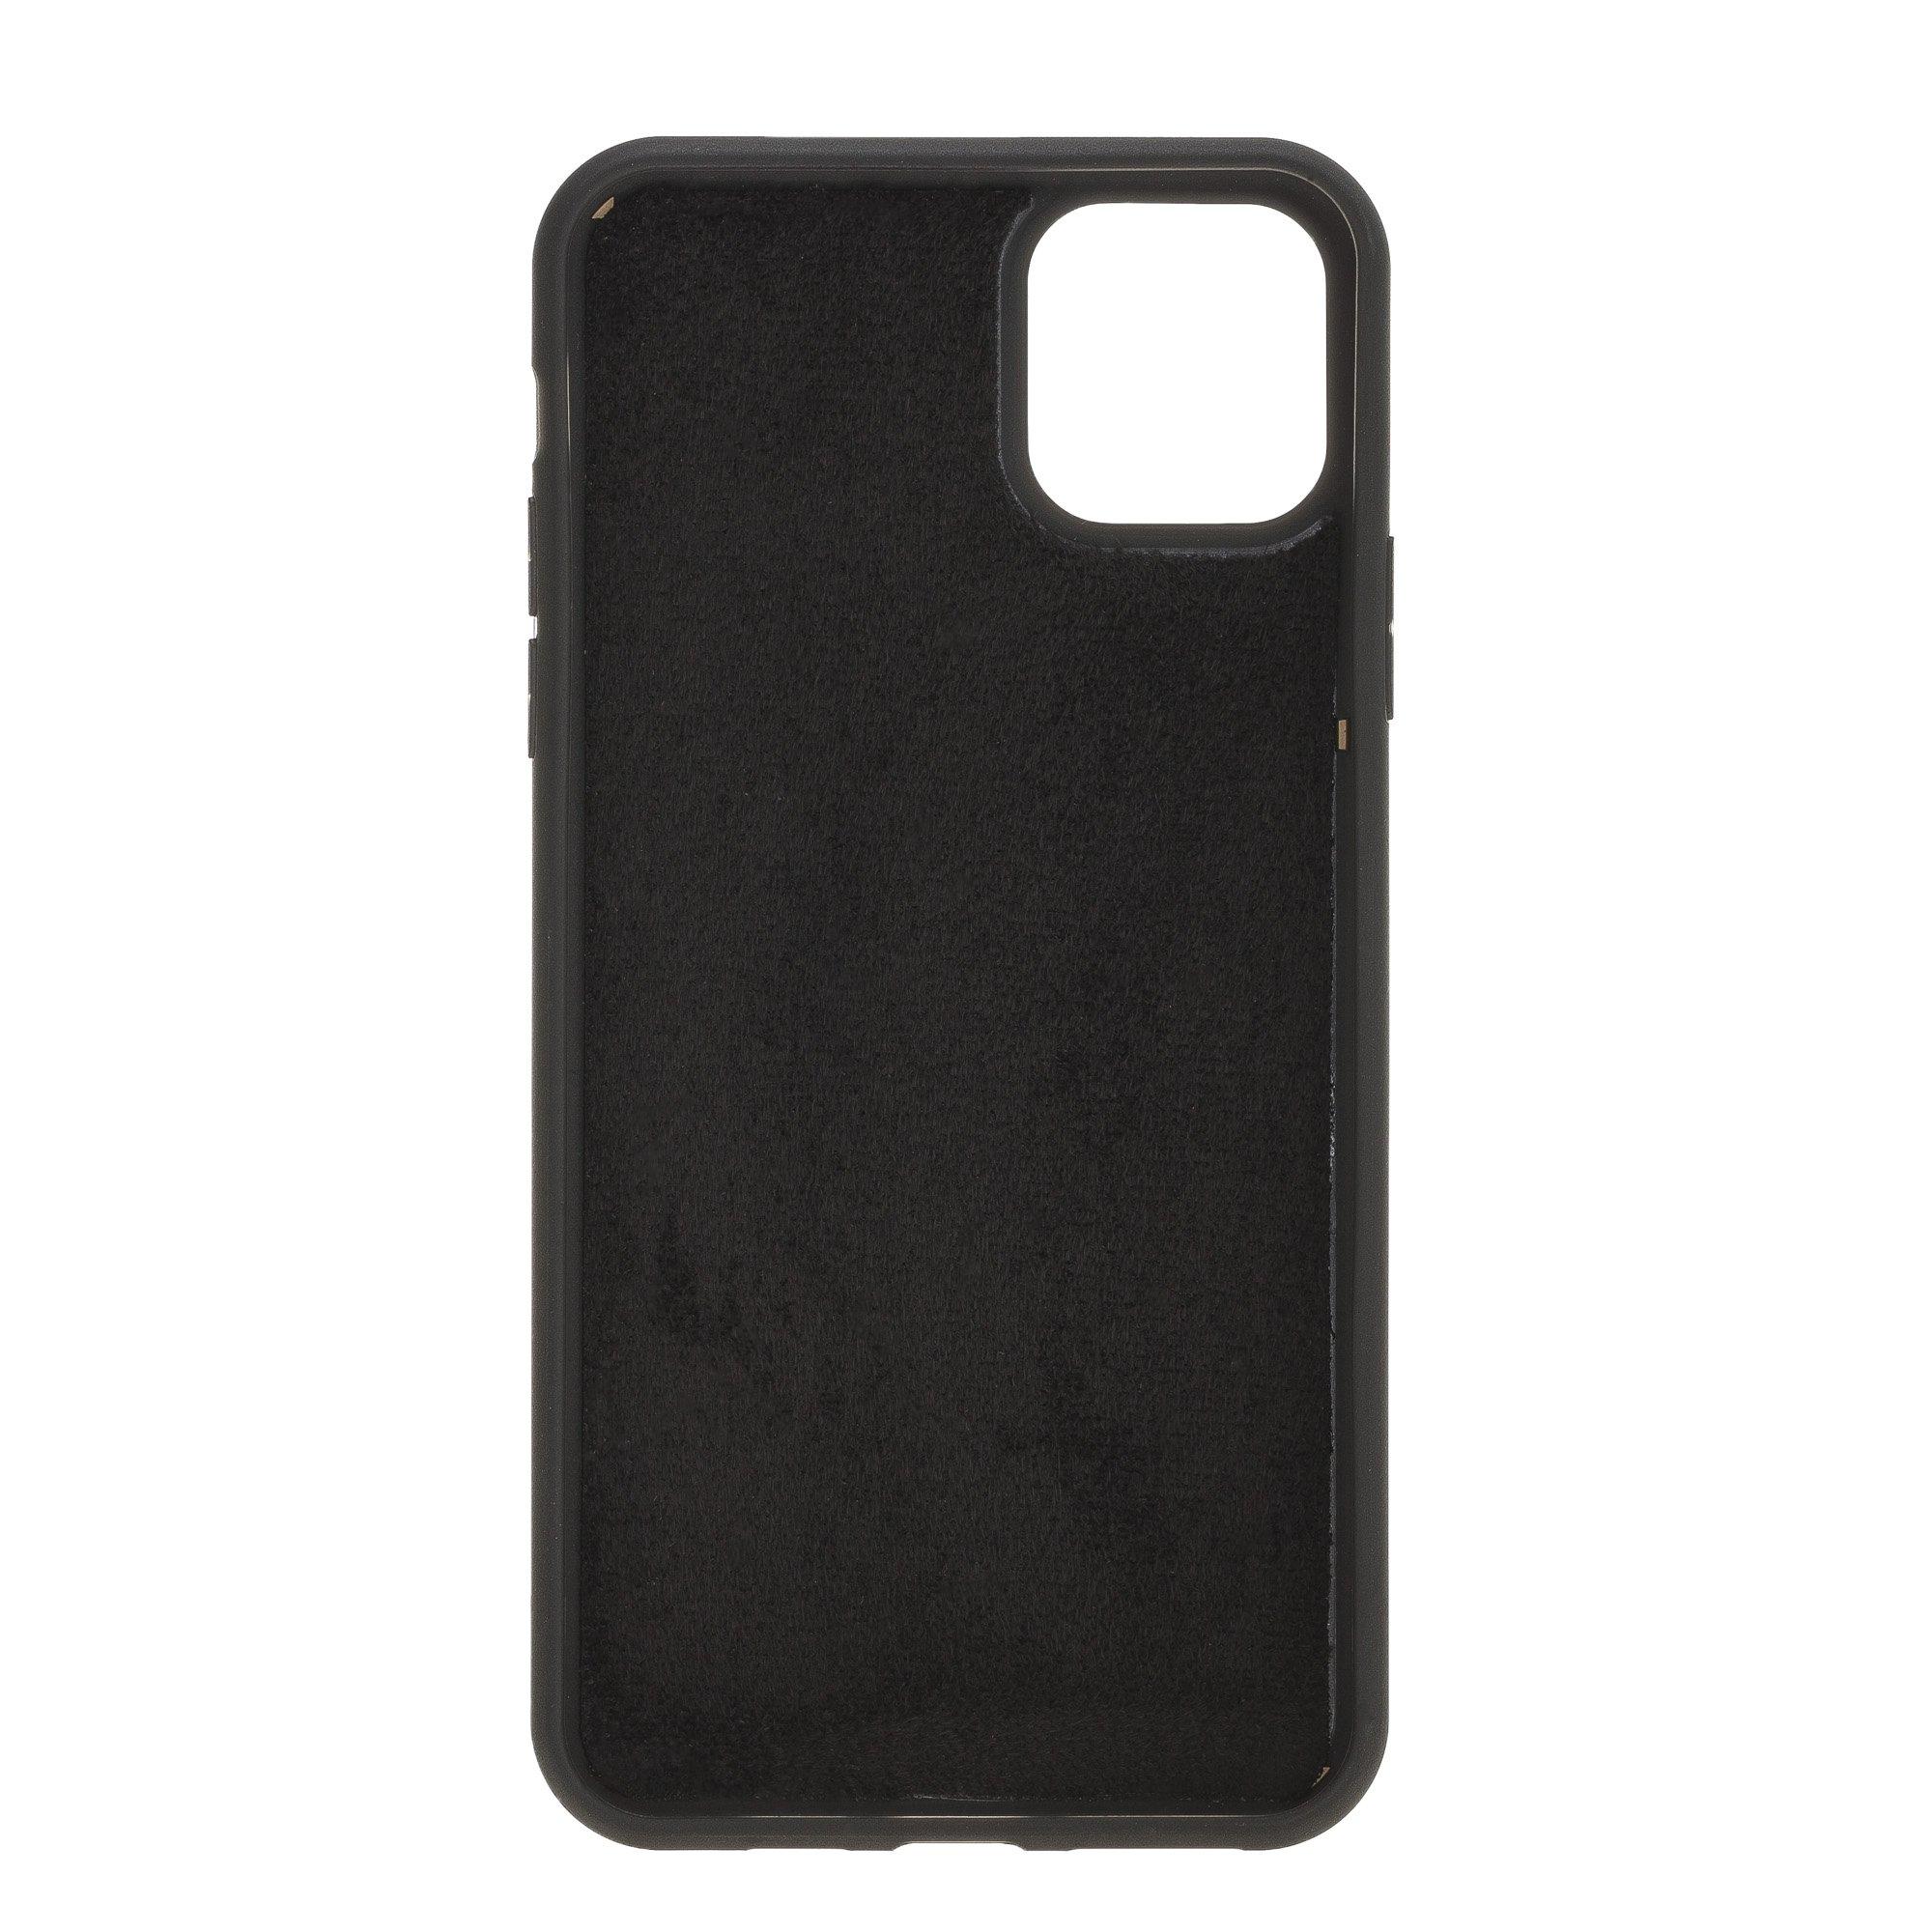 Solo Pelle Lederhülle für das iPhone 11 Pro (Max) 6.5 Zoll Stanford Case Leder Hülle Ledertasche Backcover aus echtem Leder (Schwarz)